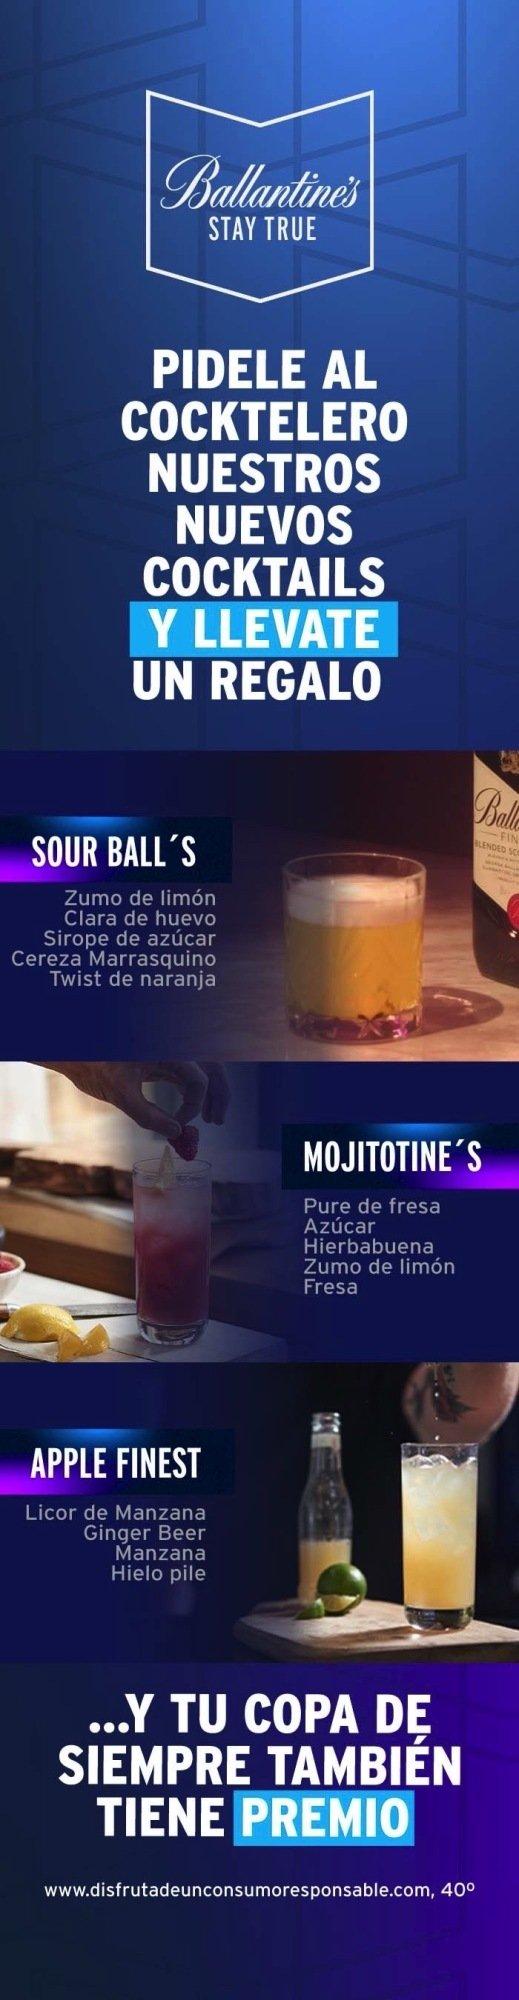 Carta de Cocktails Ballantine's